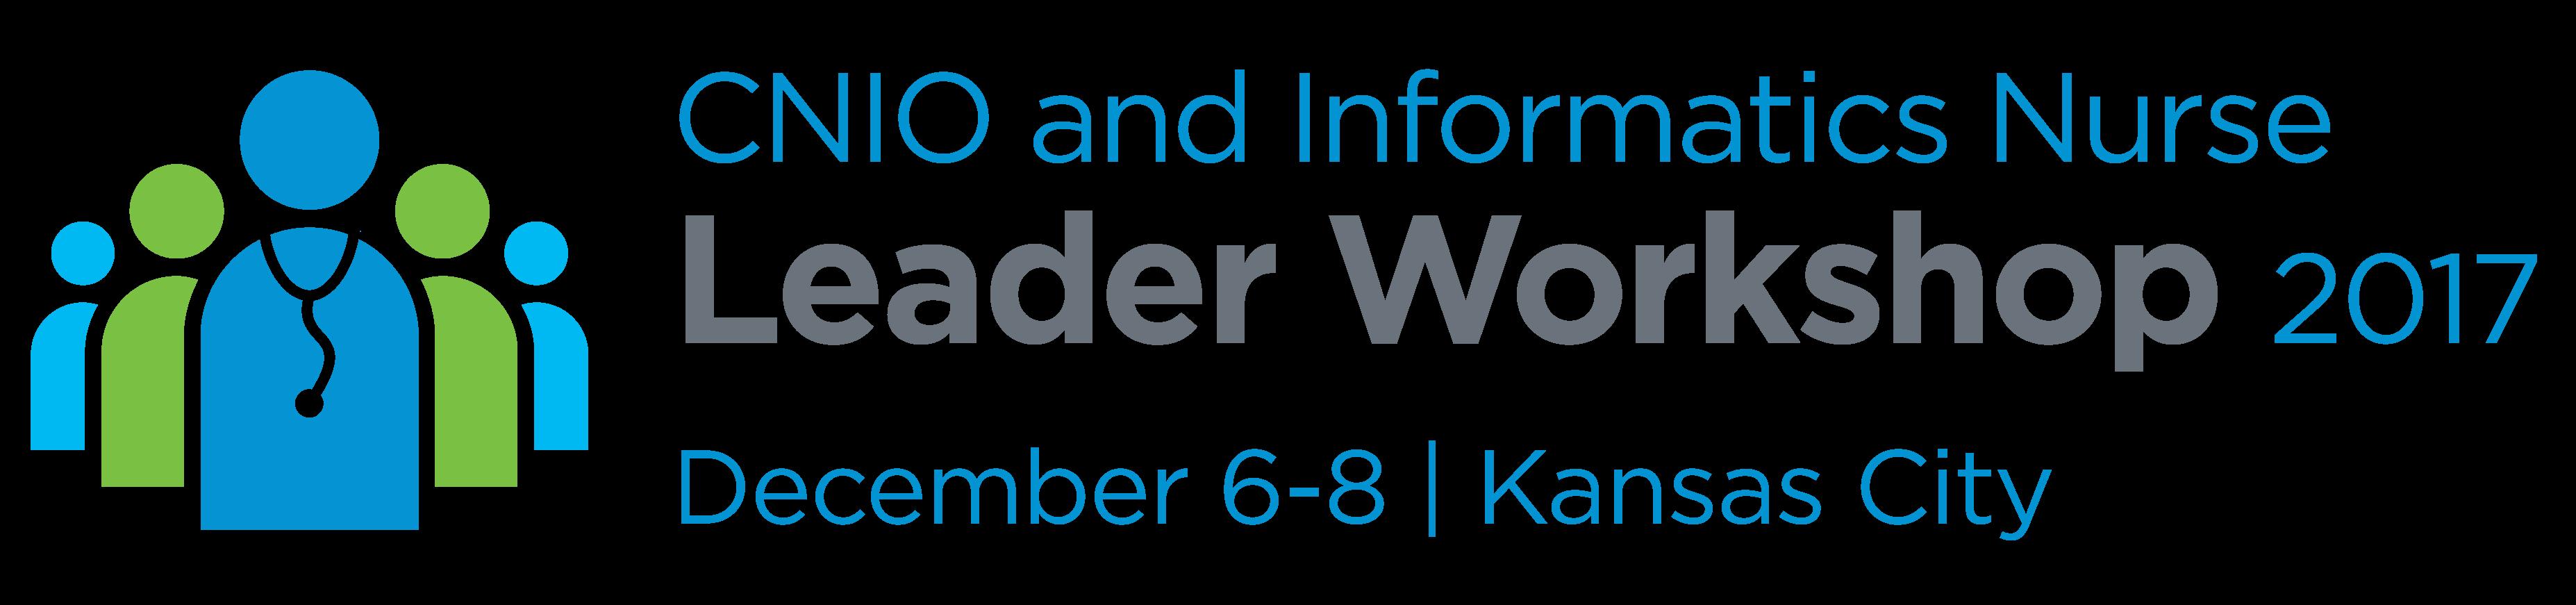 CNIO and Informatics Nurse Leader Workshop 2017 - Winter